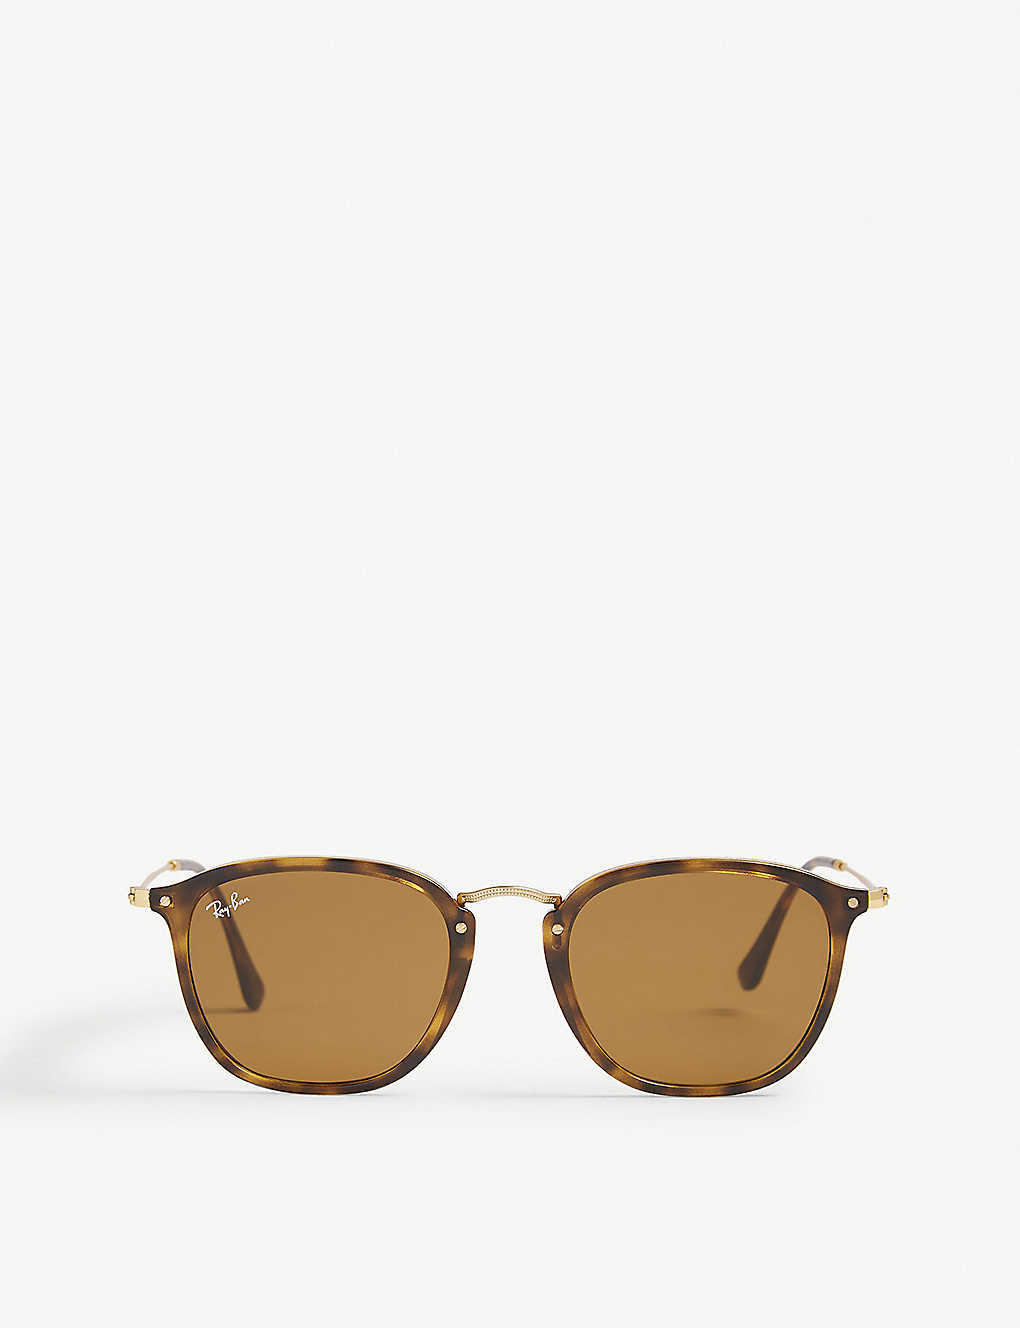 580c20cda17 RAY-BAN - Havana Rb2448n square-frame sunglasses